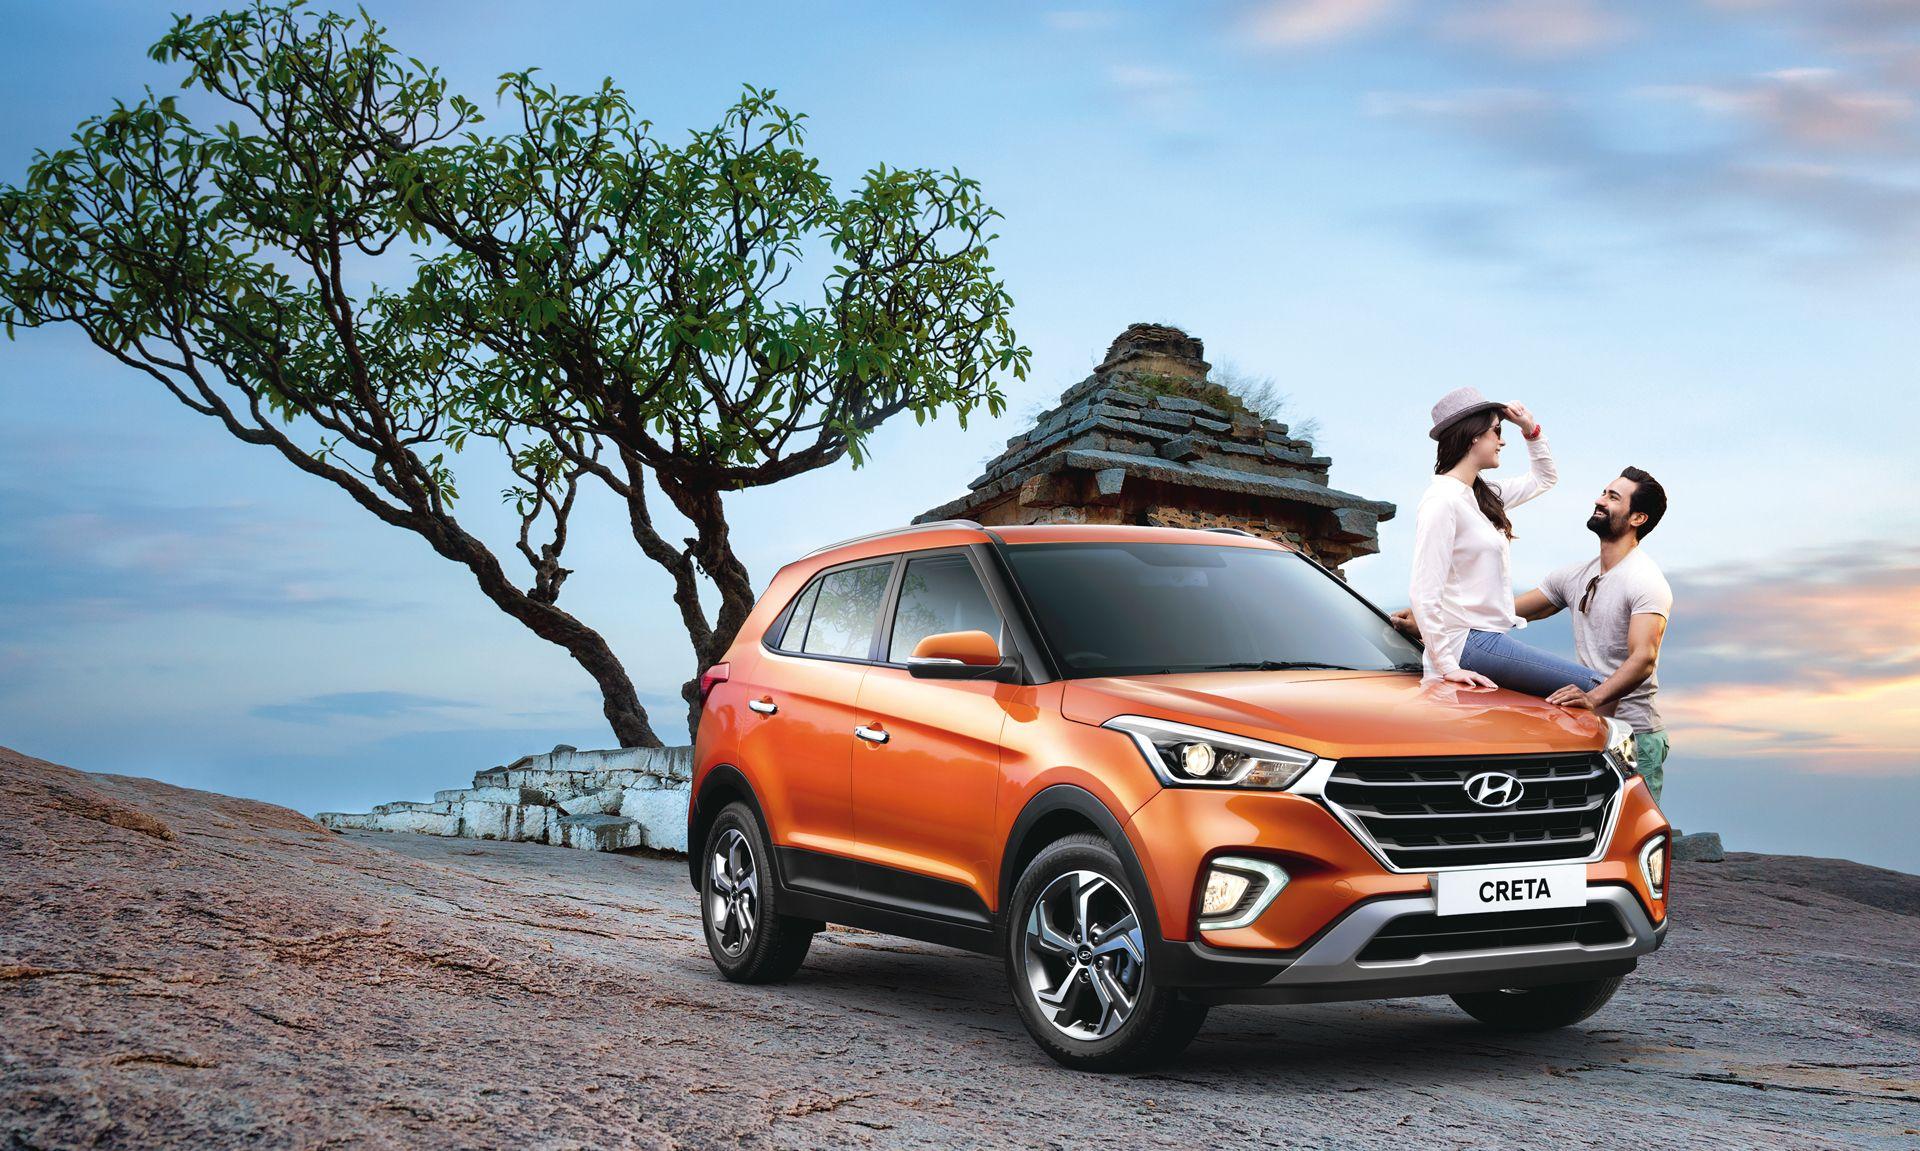 Hyundai Creta Price In Bangalore With Images Hyundai Suv Car